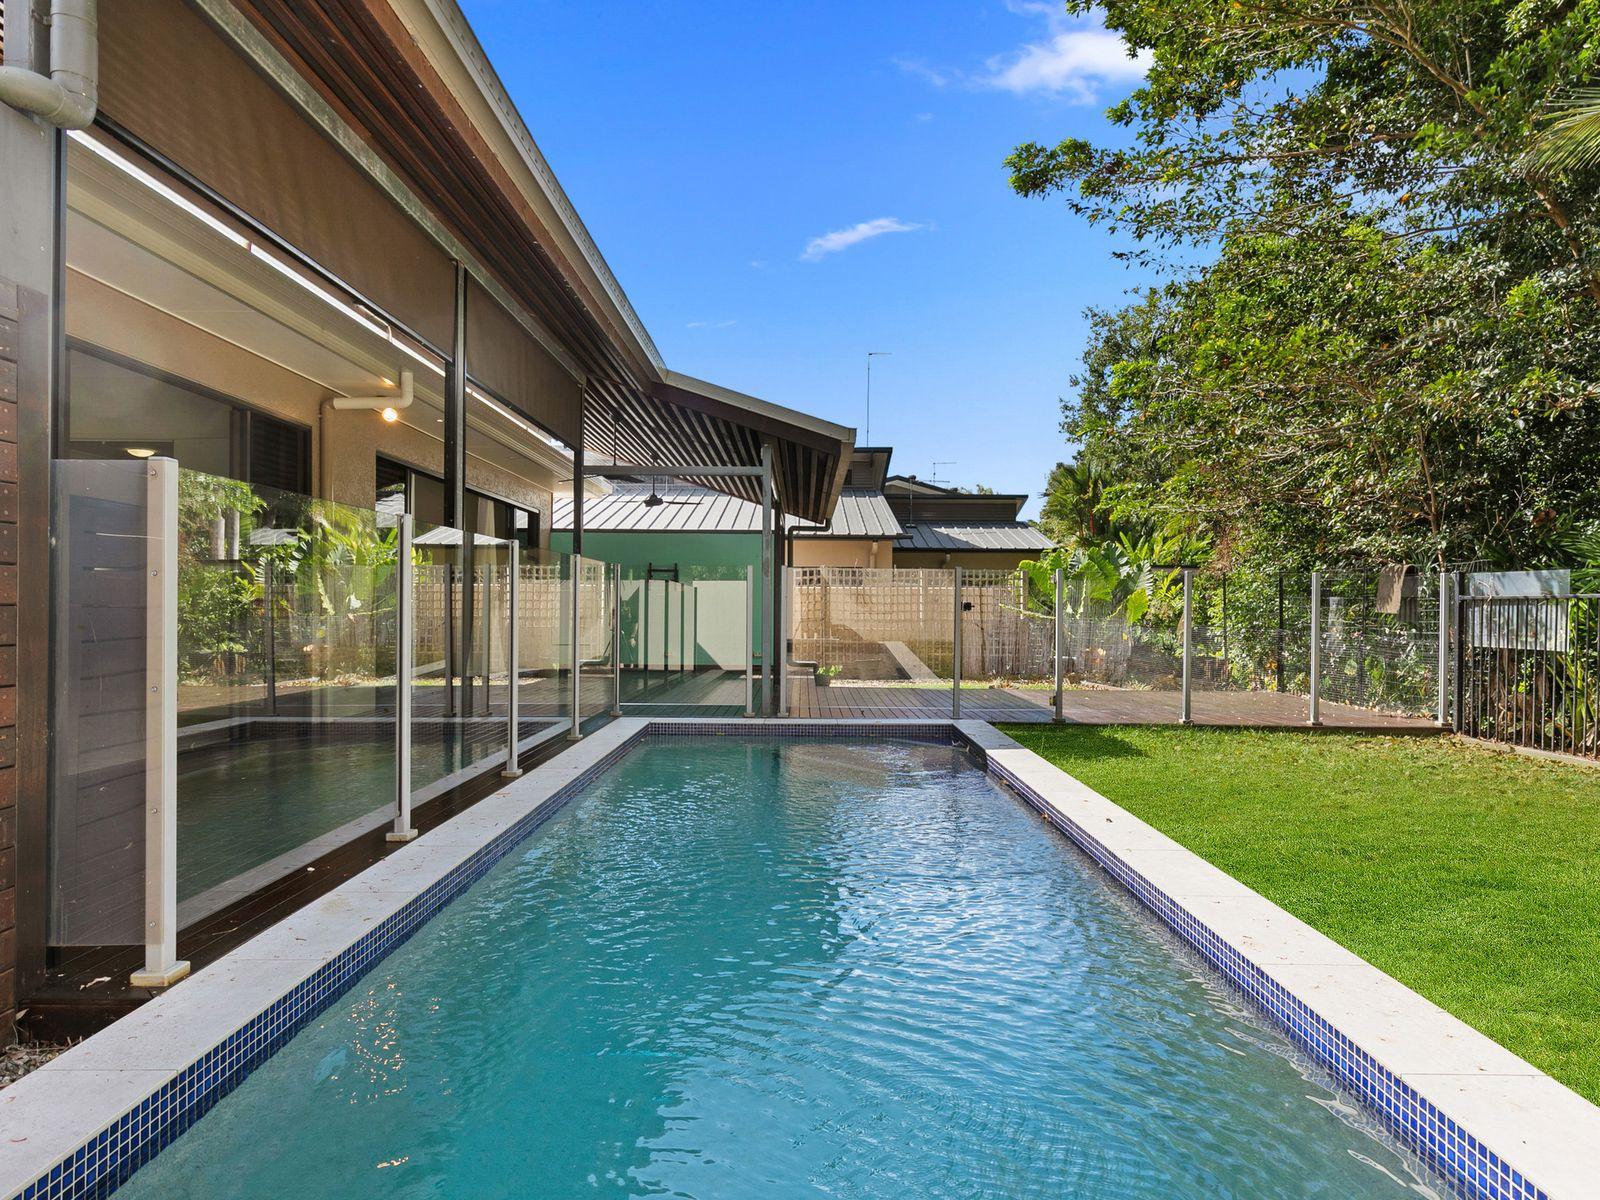 15 Sennfeld Close, Palm Cove, QLD 4879